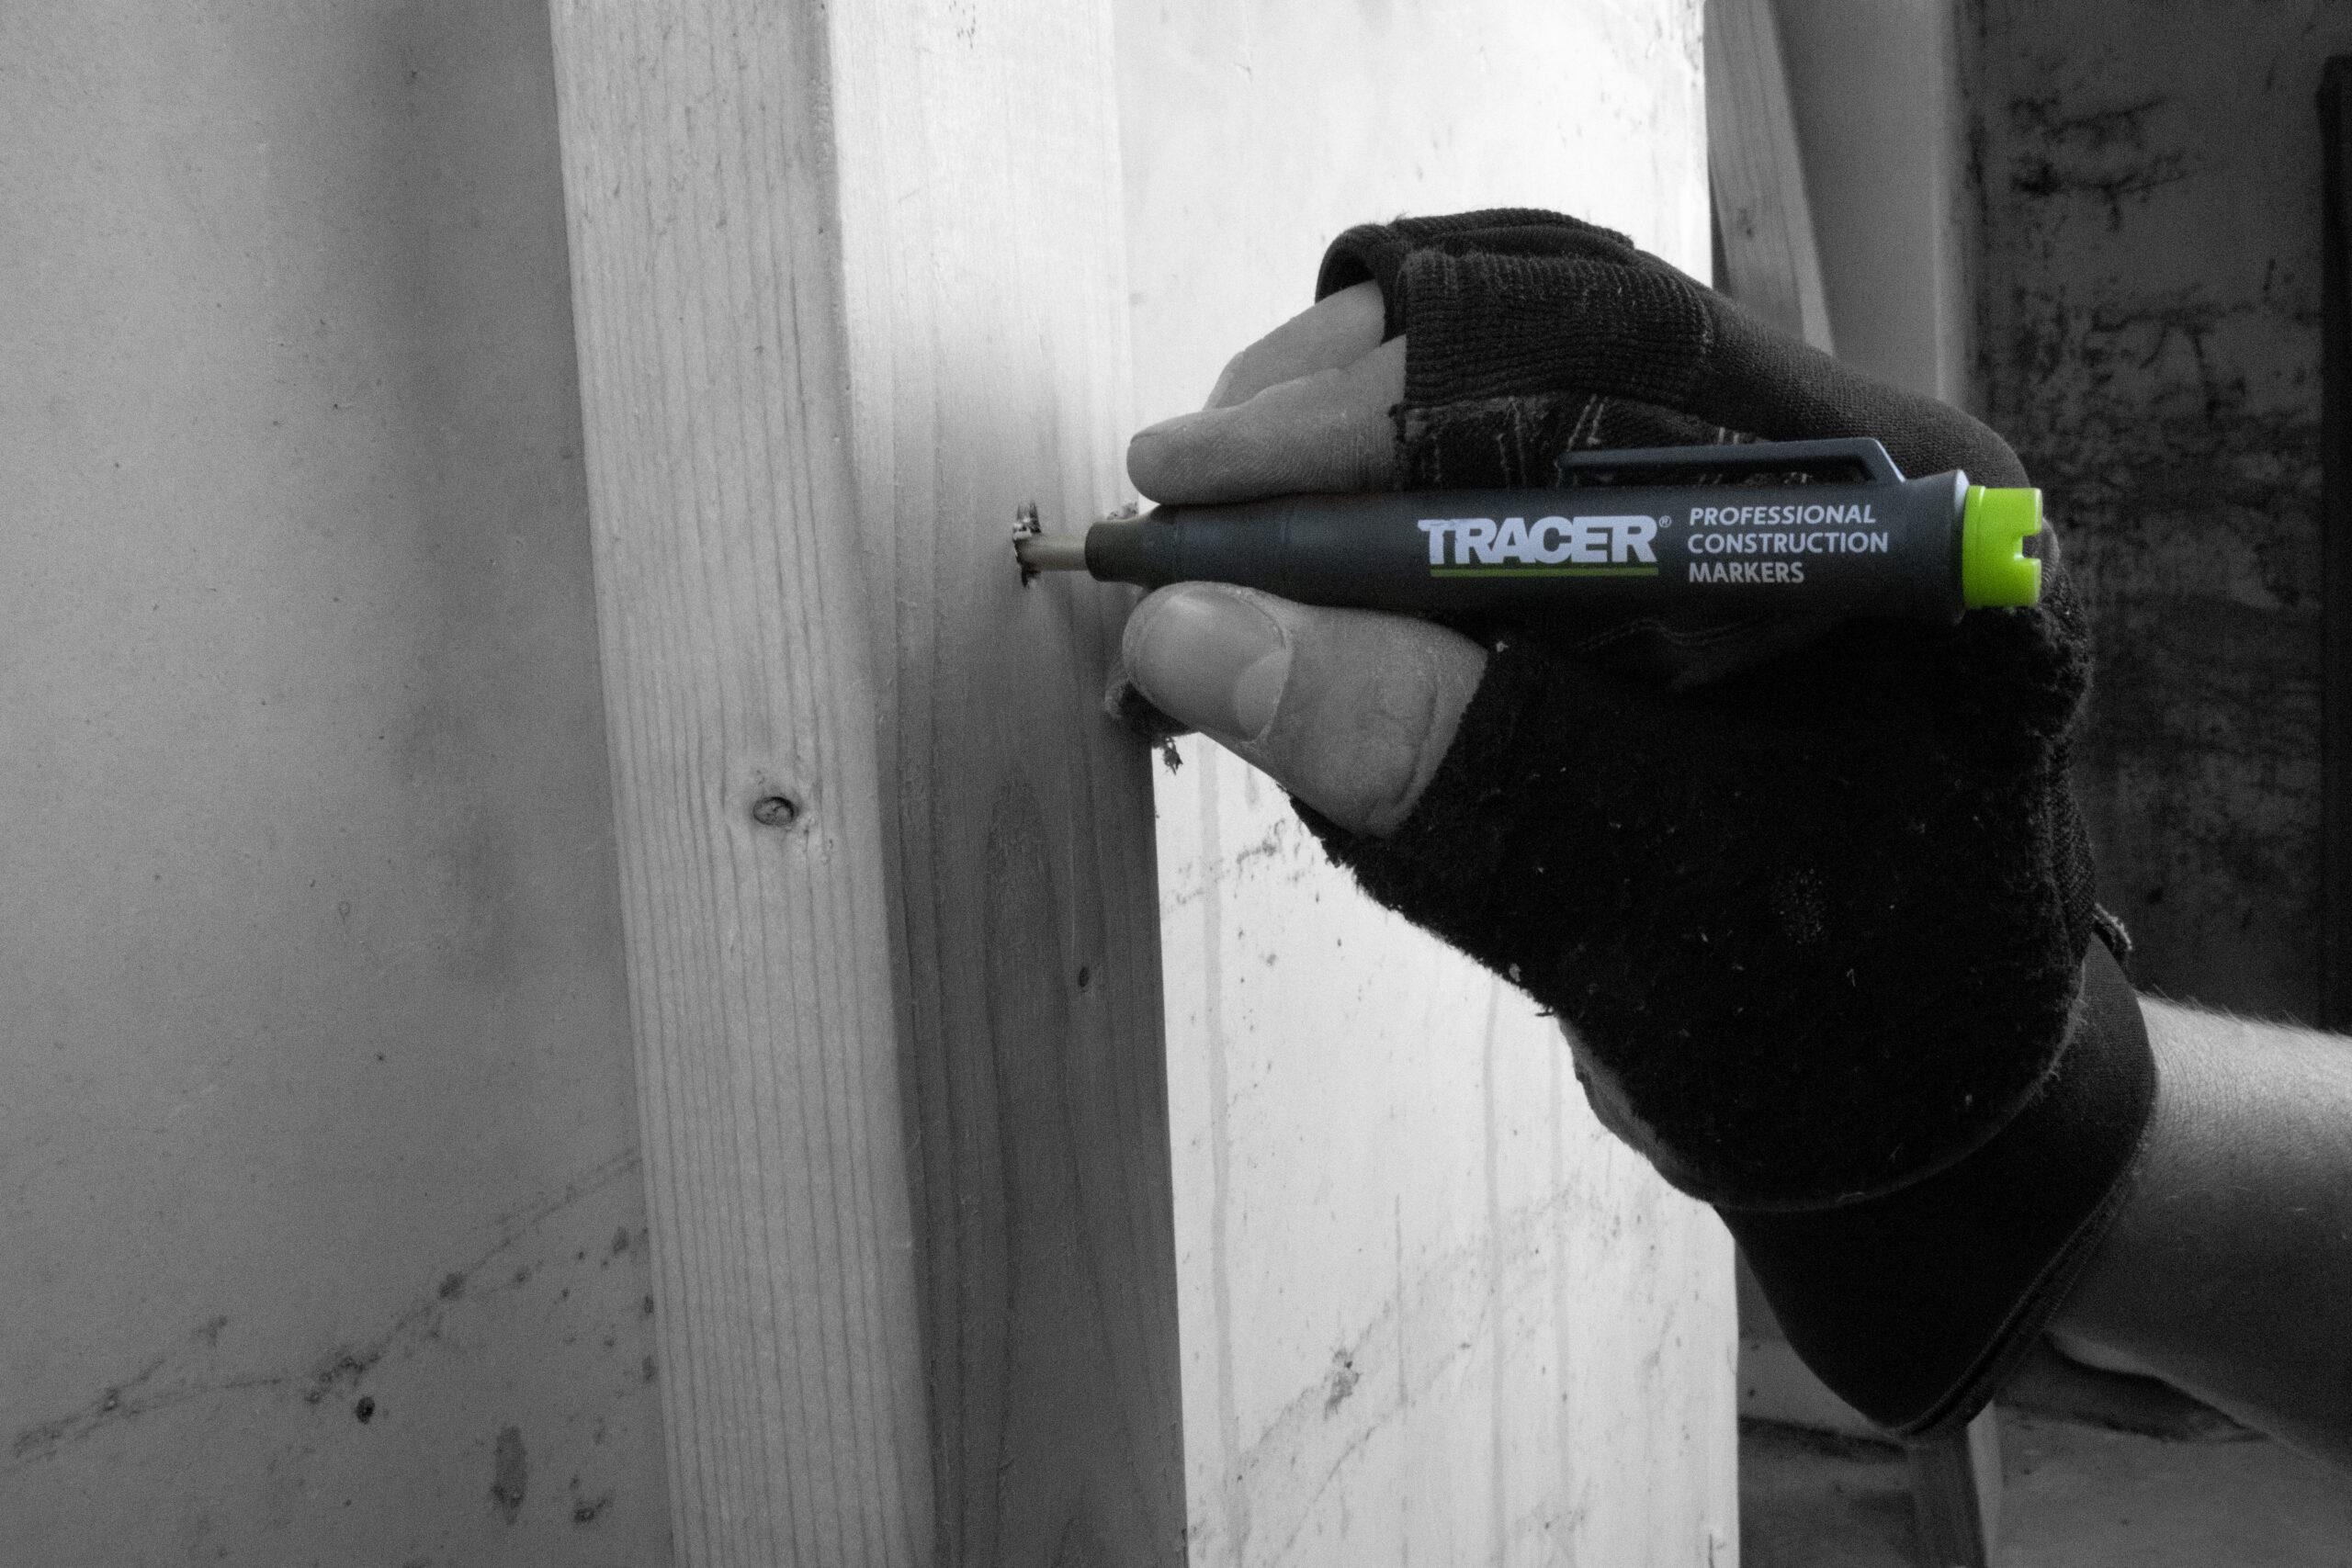 TRACER Deep Hole Marker